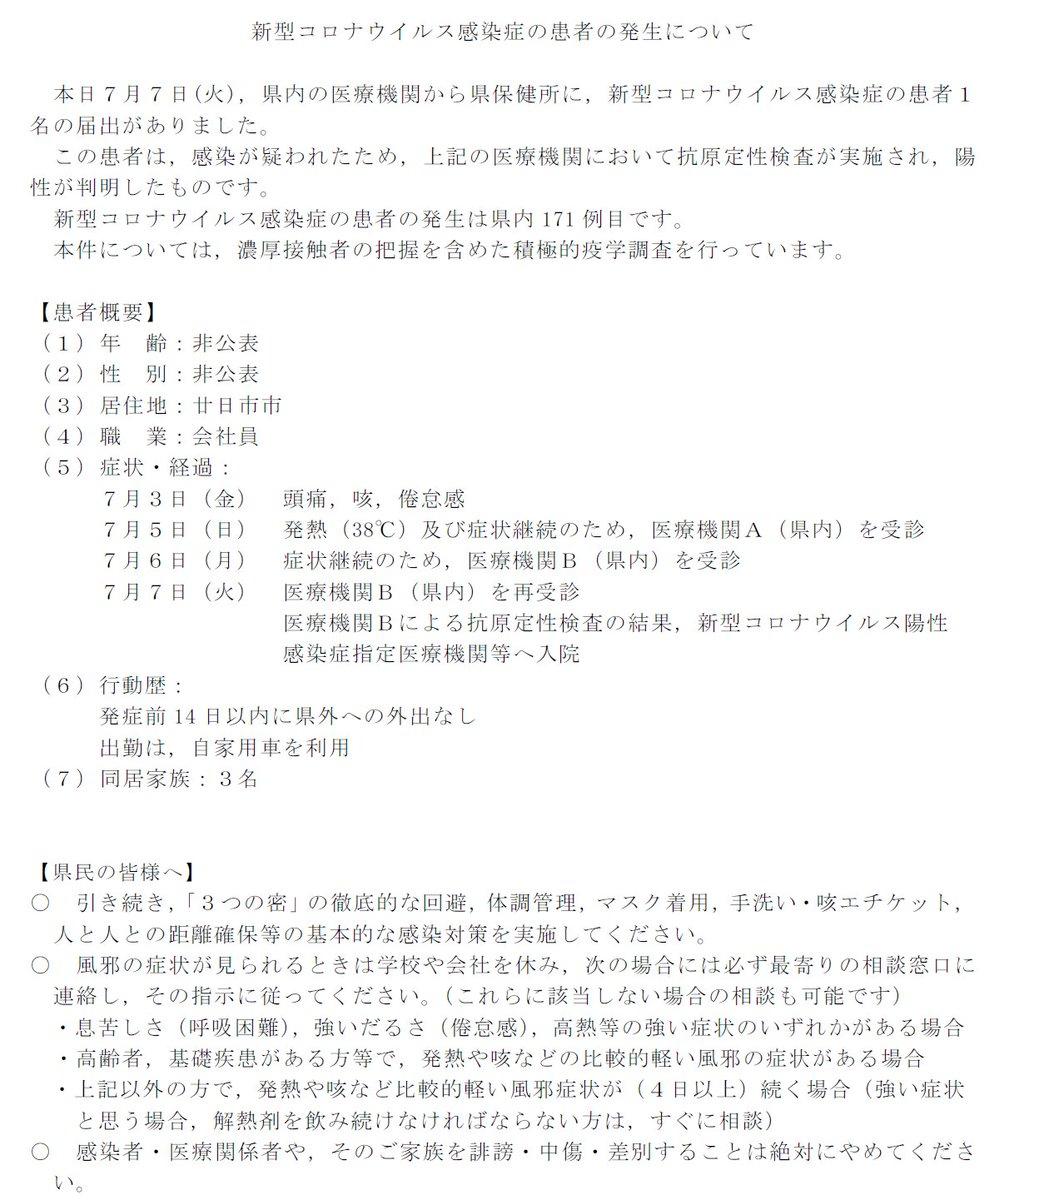 Twitter 広島 コロナ 18日の公示 広島が菊池涼らコロナで17人大量入れ替え